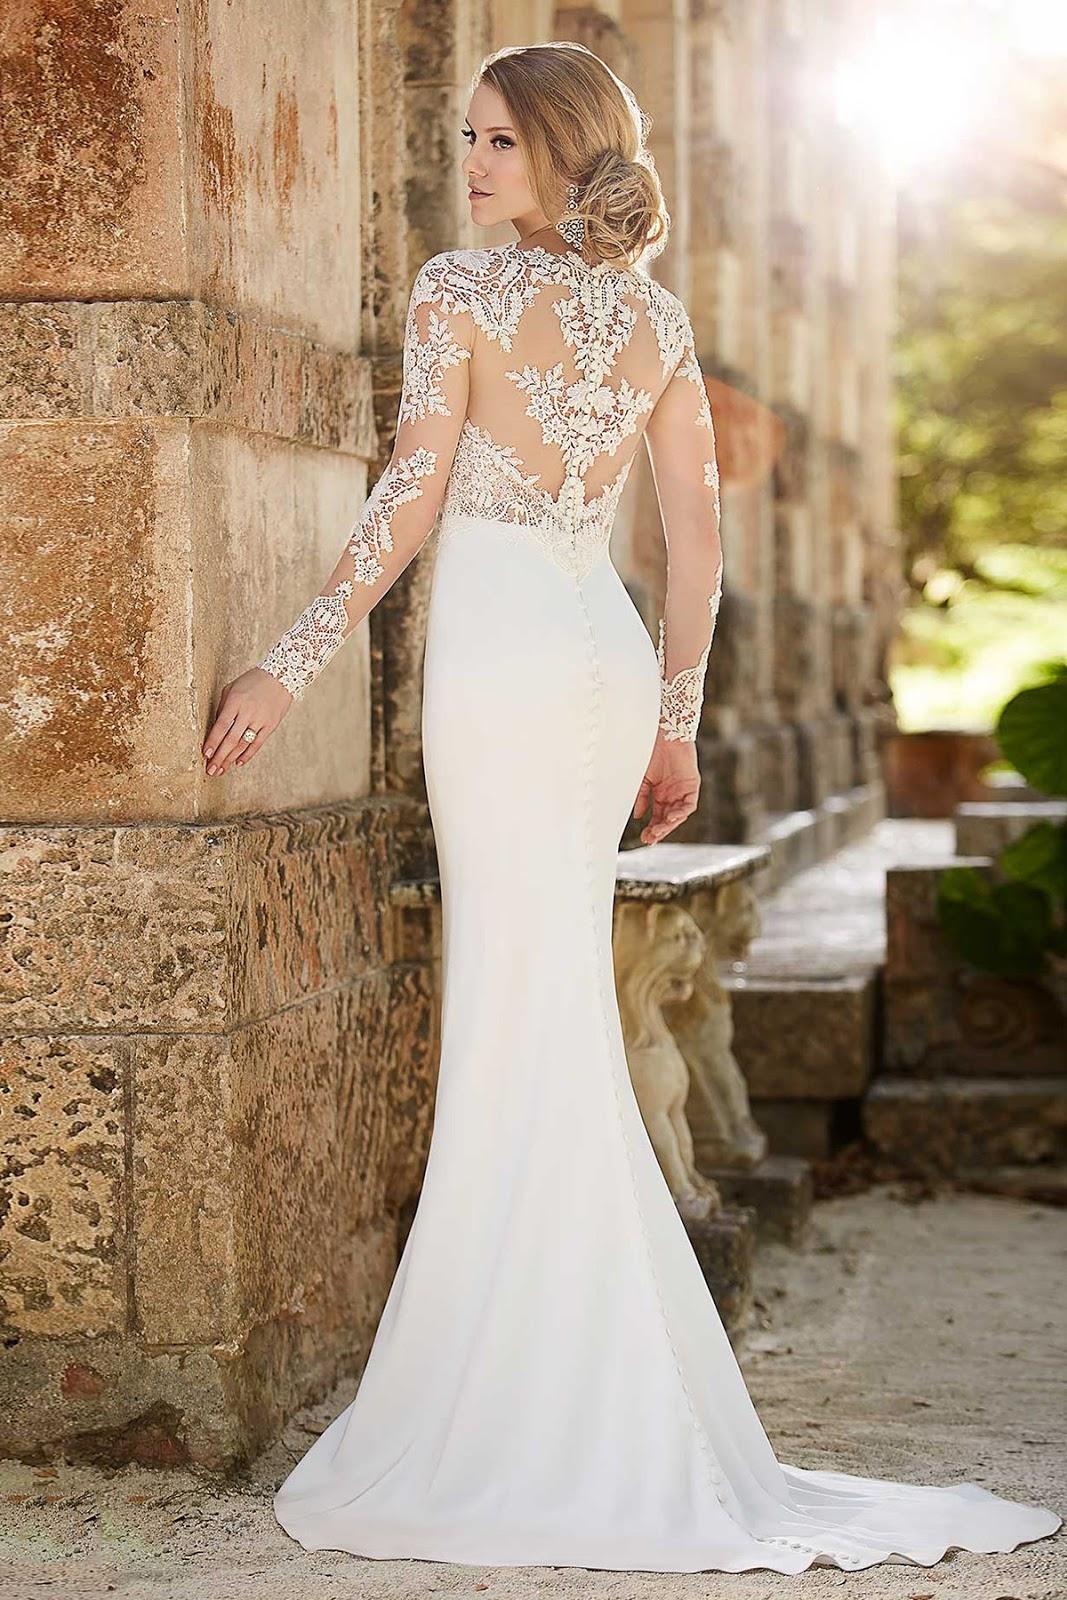 Landybridal Wedding Dresses | daisy elegant